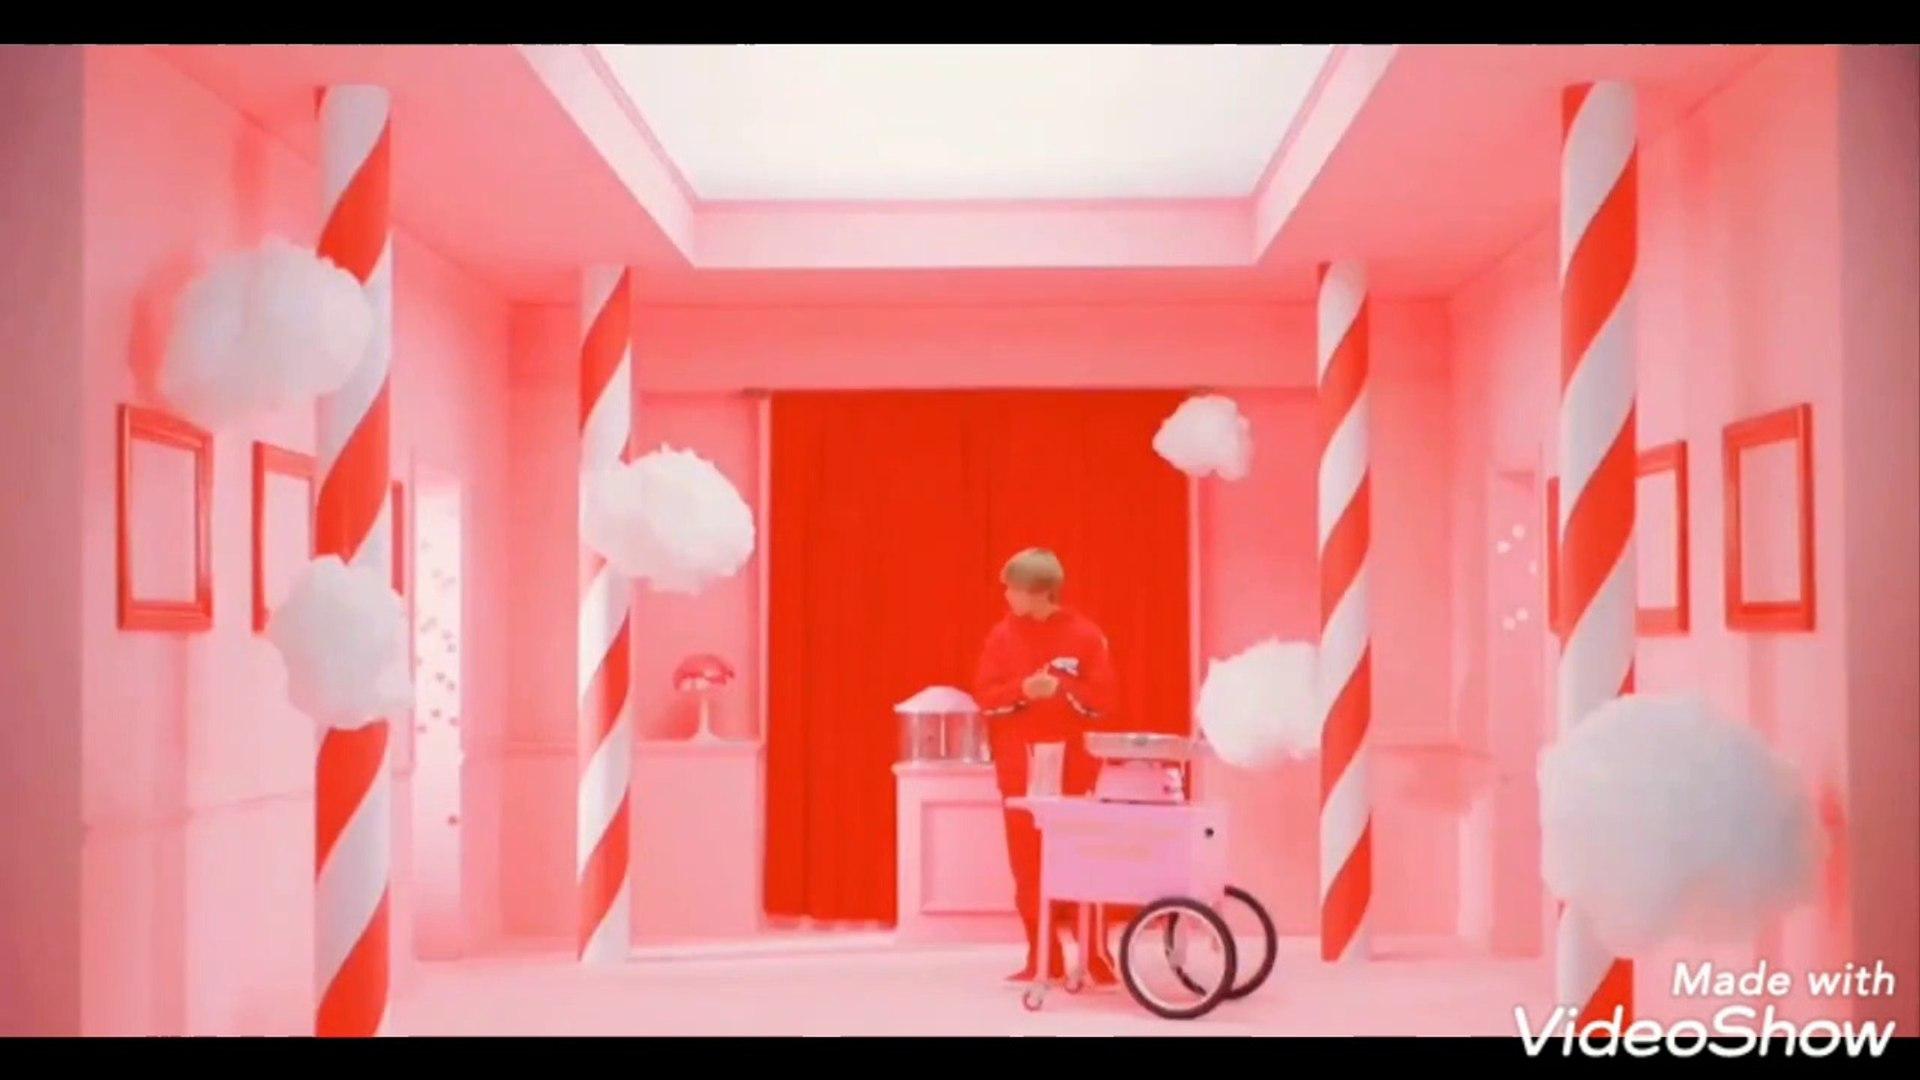 Kimtaehyung Cute Video // Kimtaehyung Cute and funny video 2020